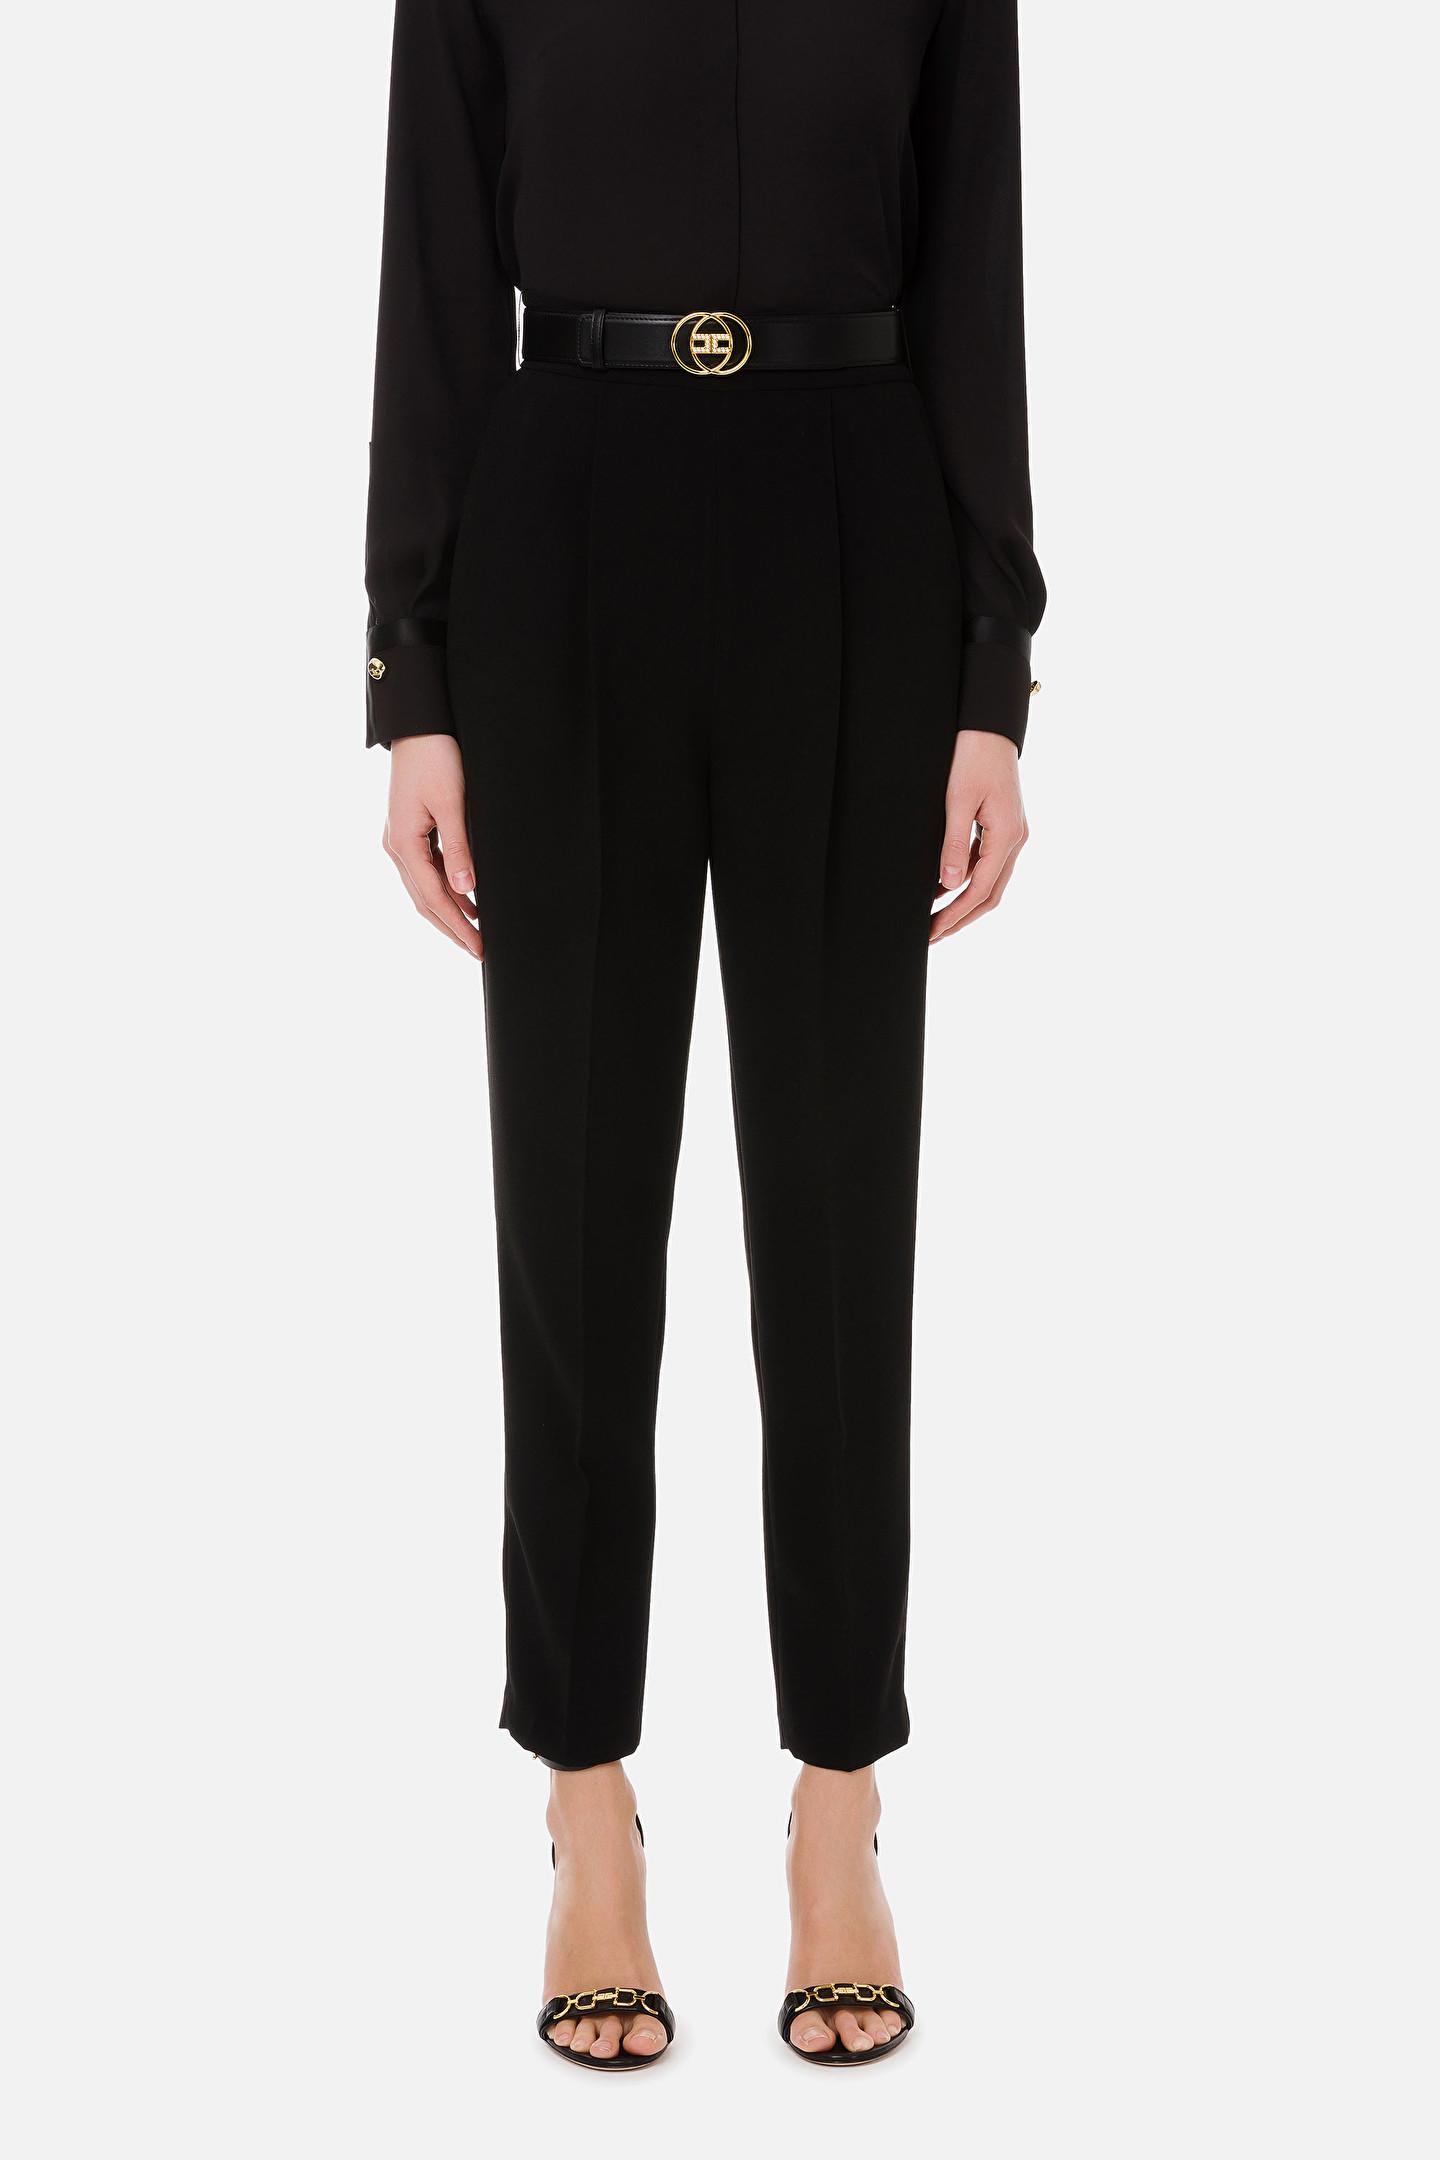 Pantalone skinny nero Elisabetta Franchi   PA38211E2110